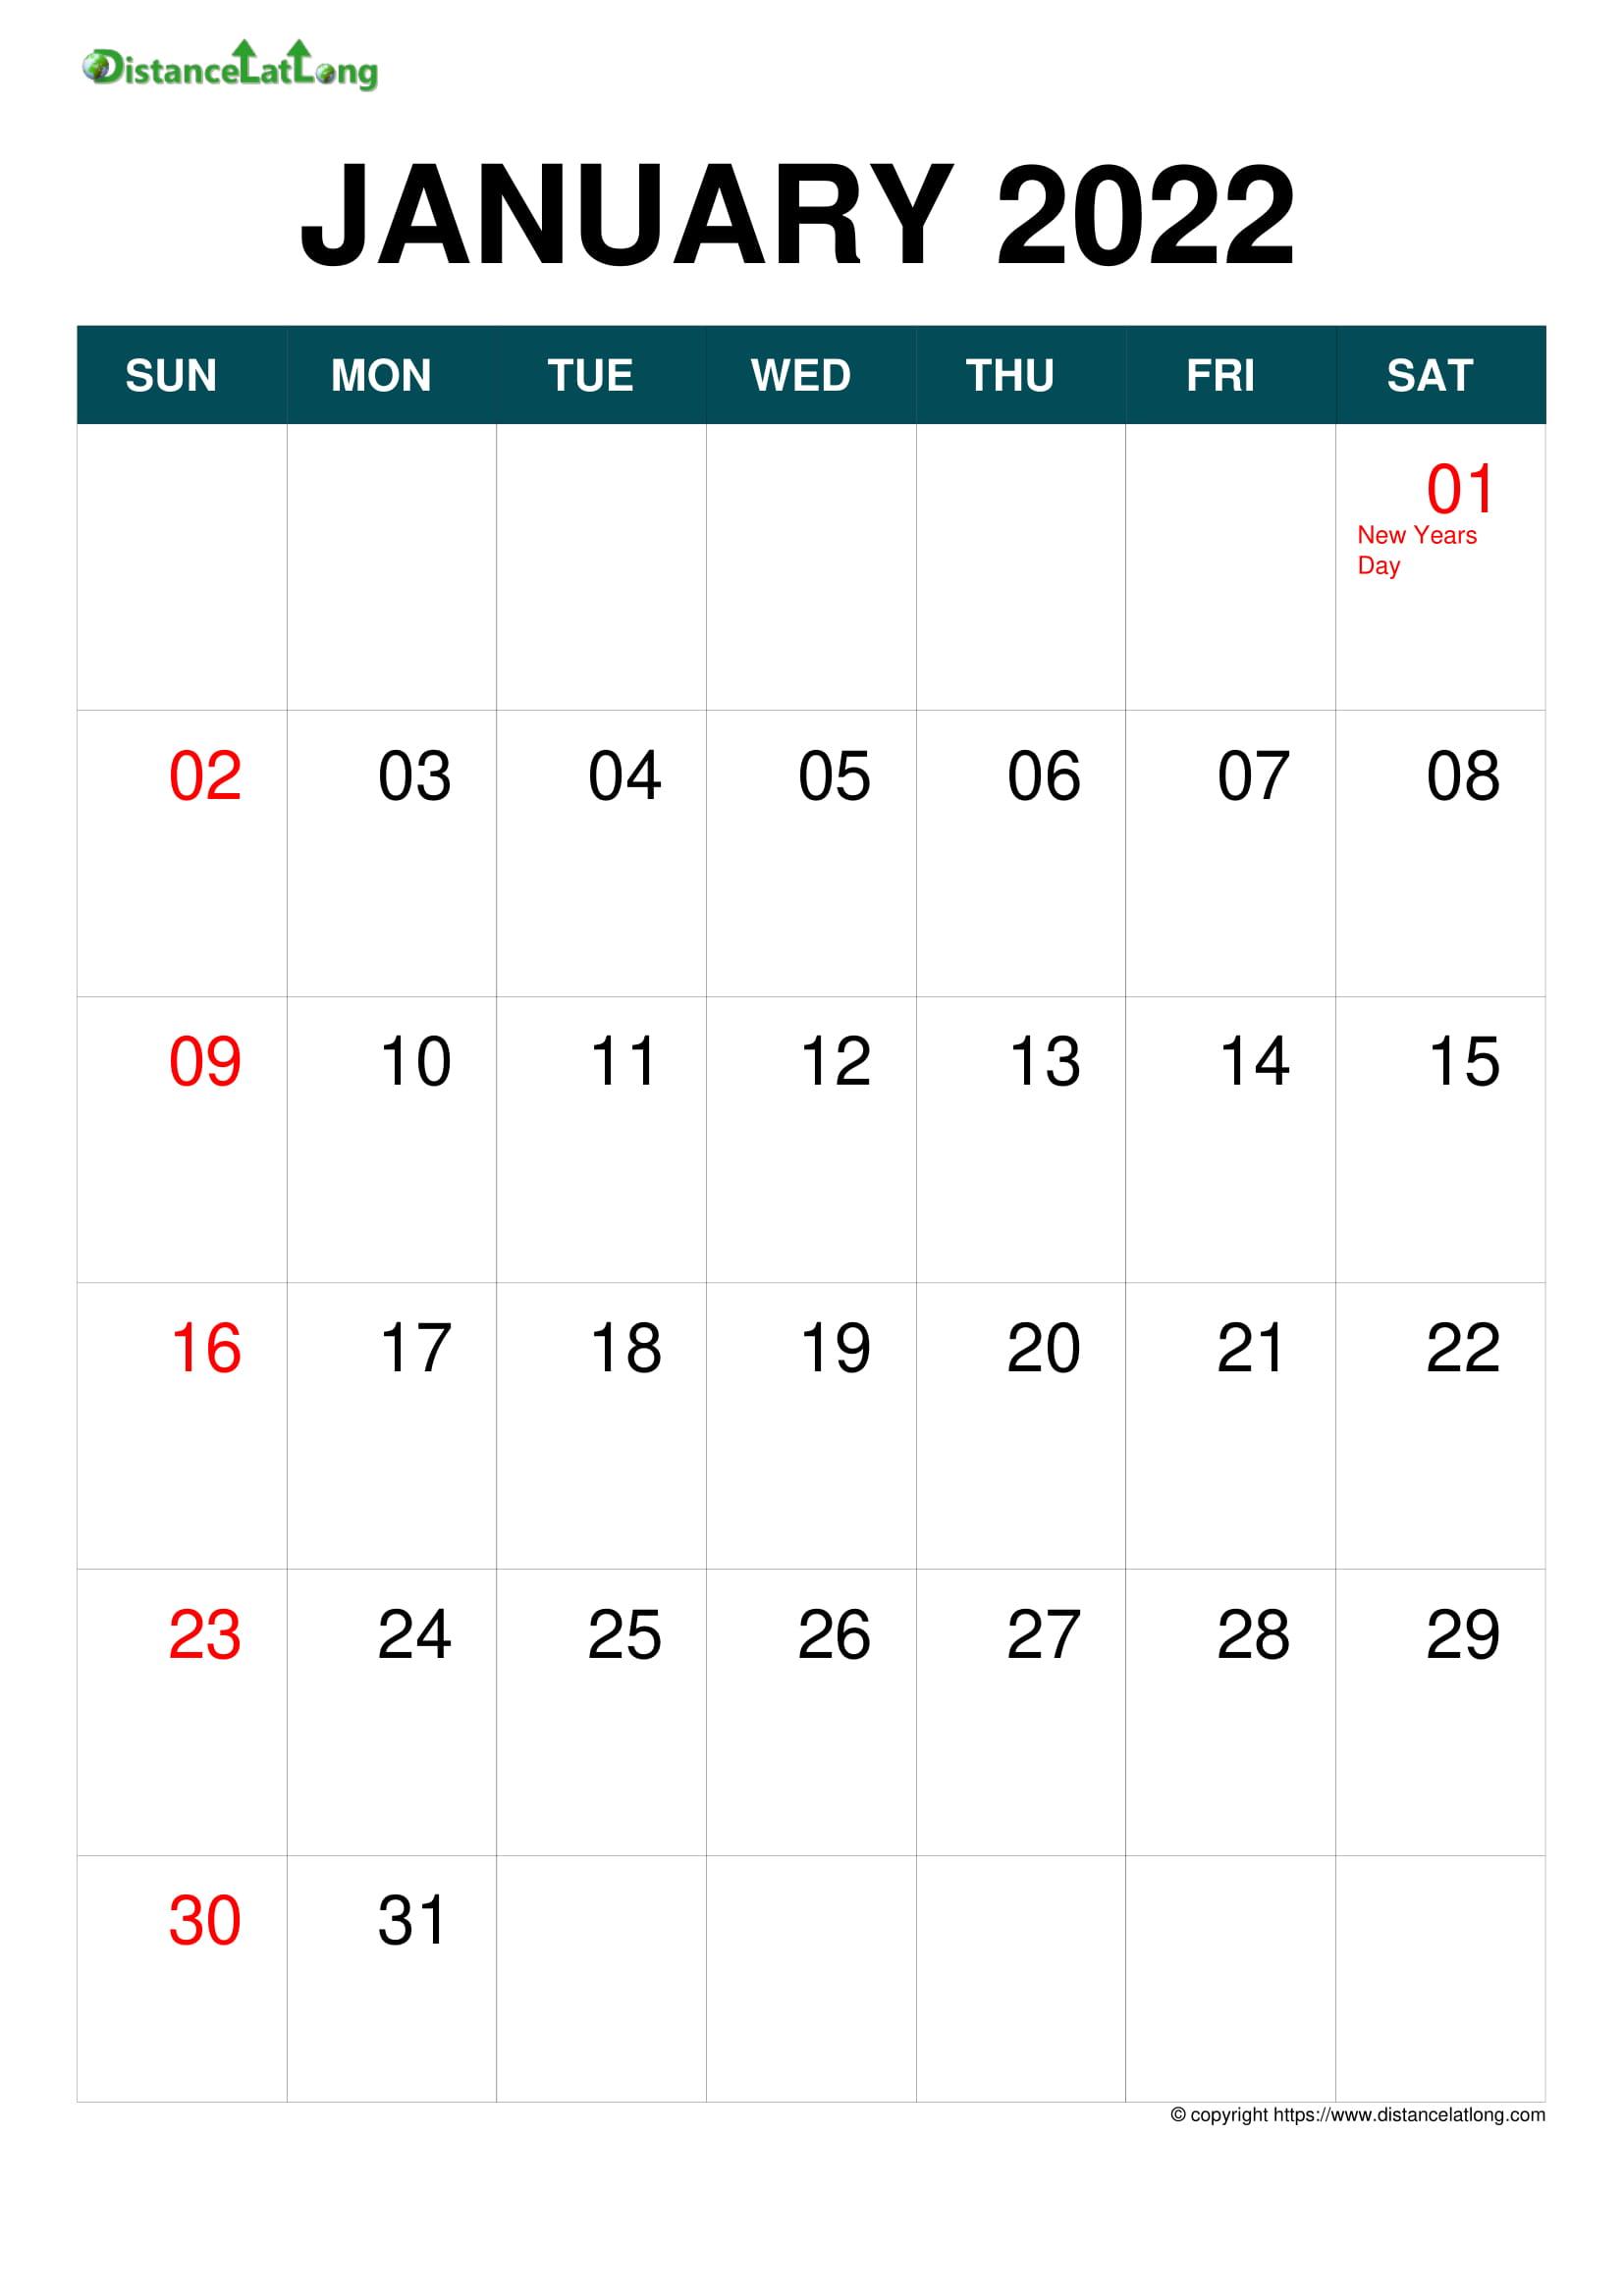 Jewish Holidays Calendar 2022.2022 Holiday Calendar Holidayportrait Orientation Free Printable Templates Free Download Distancelatlong Com